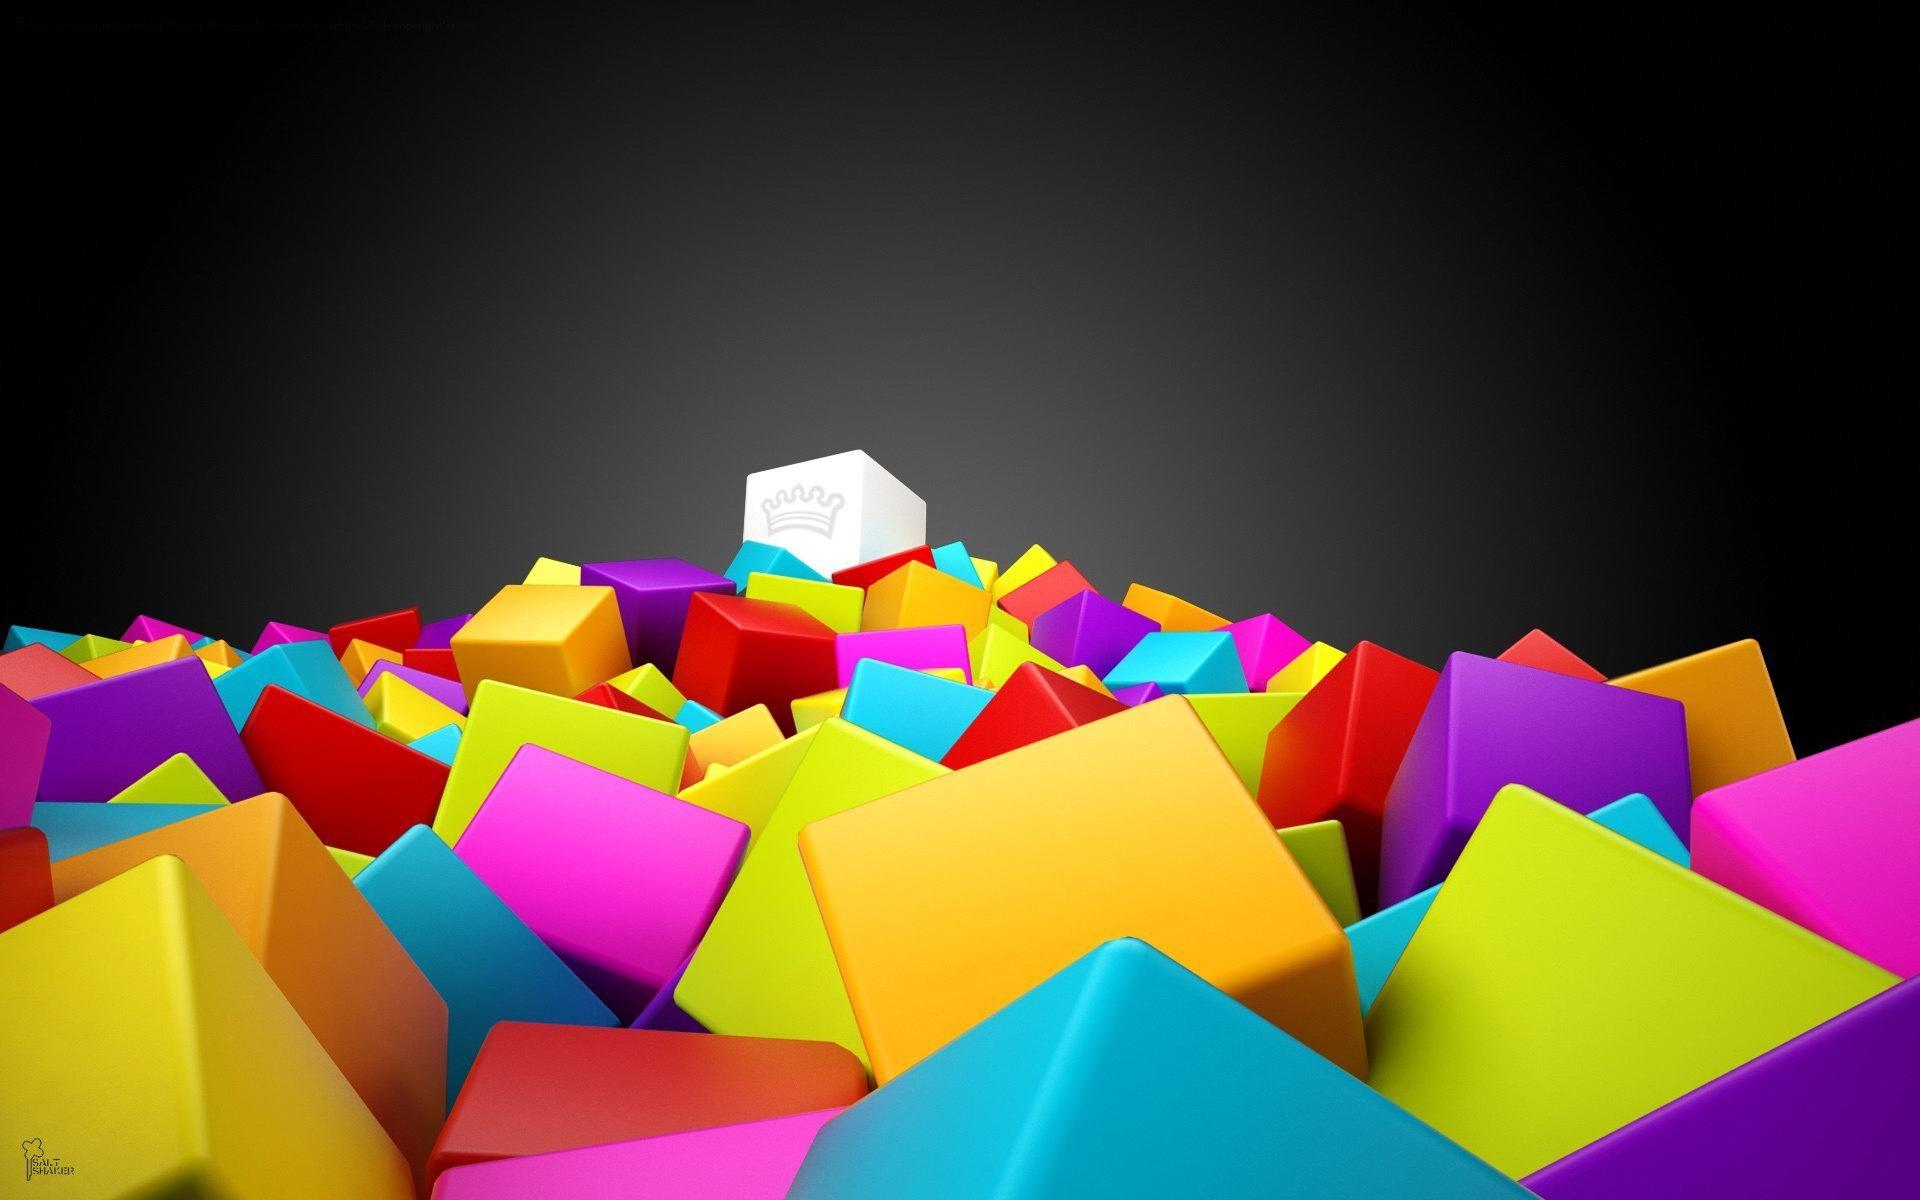 11 3D Colorful Graphic Design Images